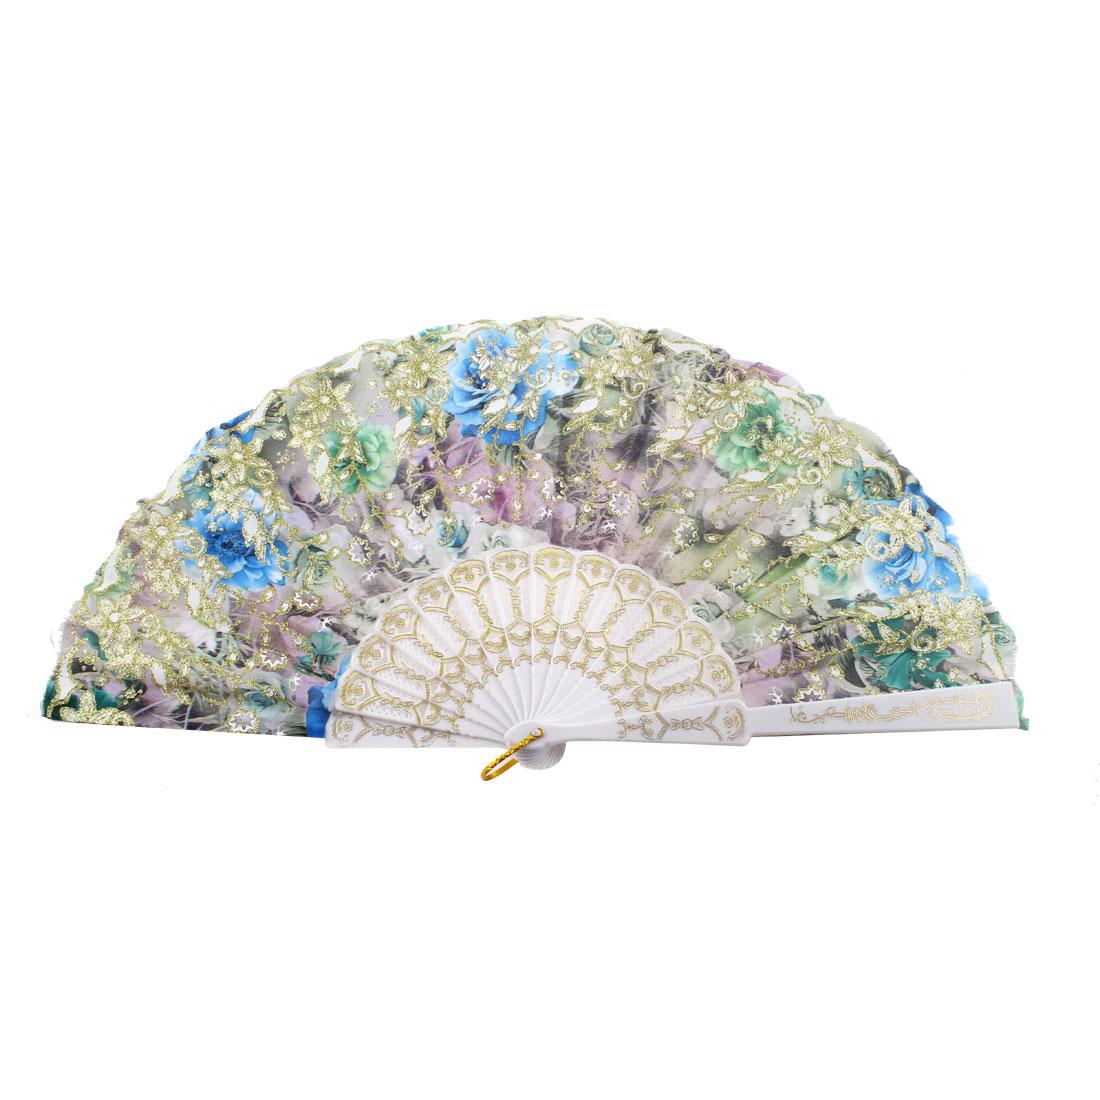 Gold Tone Glittery Powder Decor Floral Pattern Folding Dancing Hand Fan